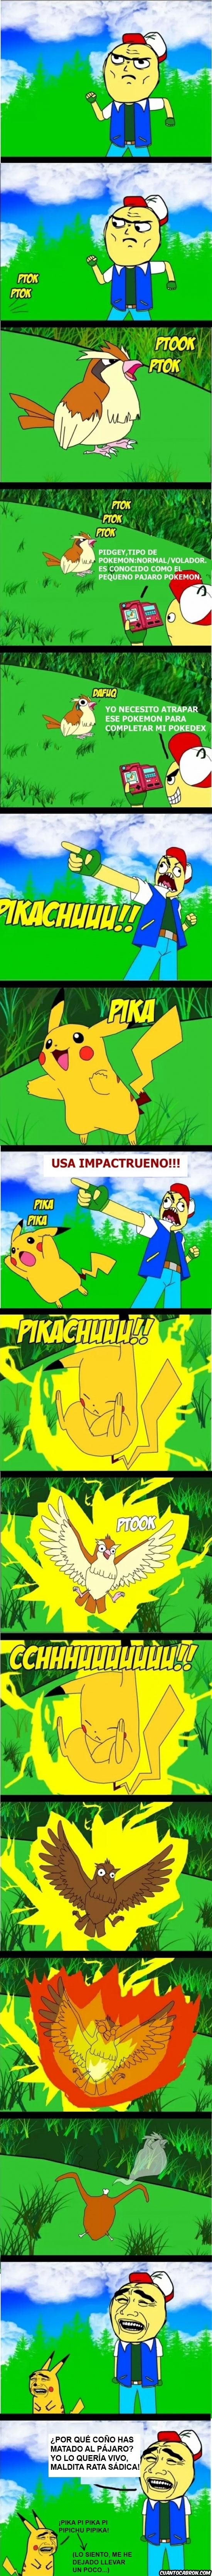 ash,capturar,entrenador,matar,pidgey,pikachu,pokemon,vivo